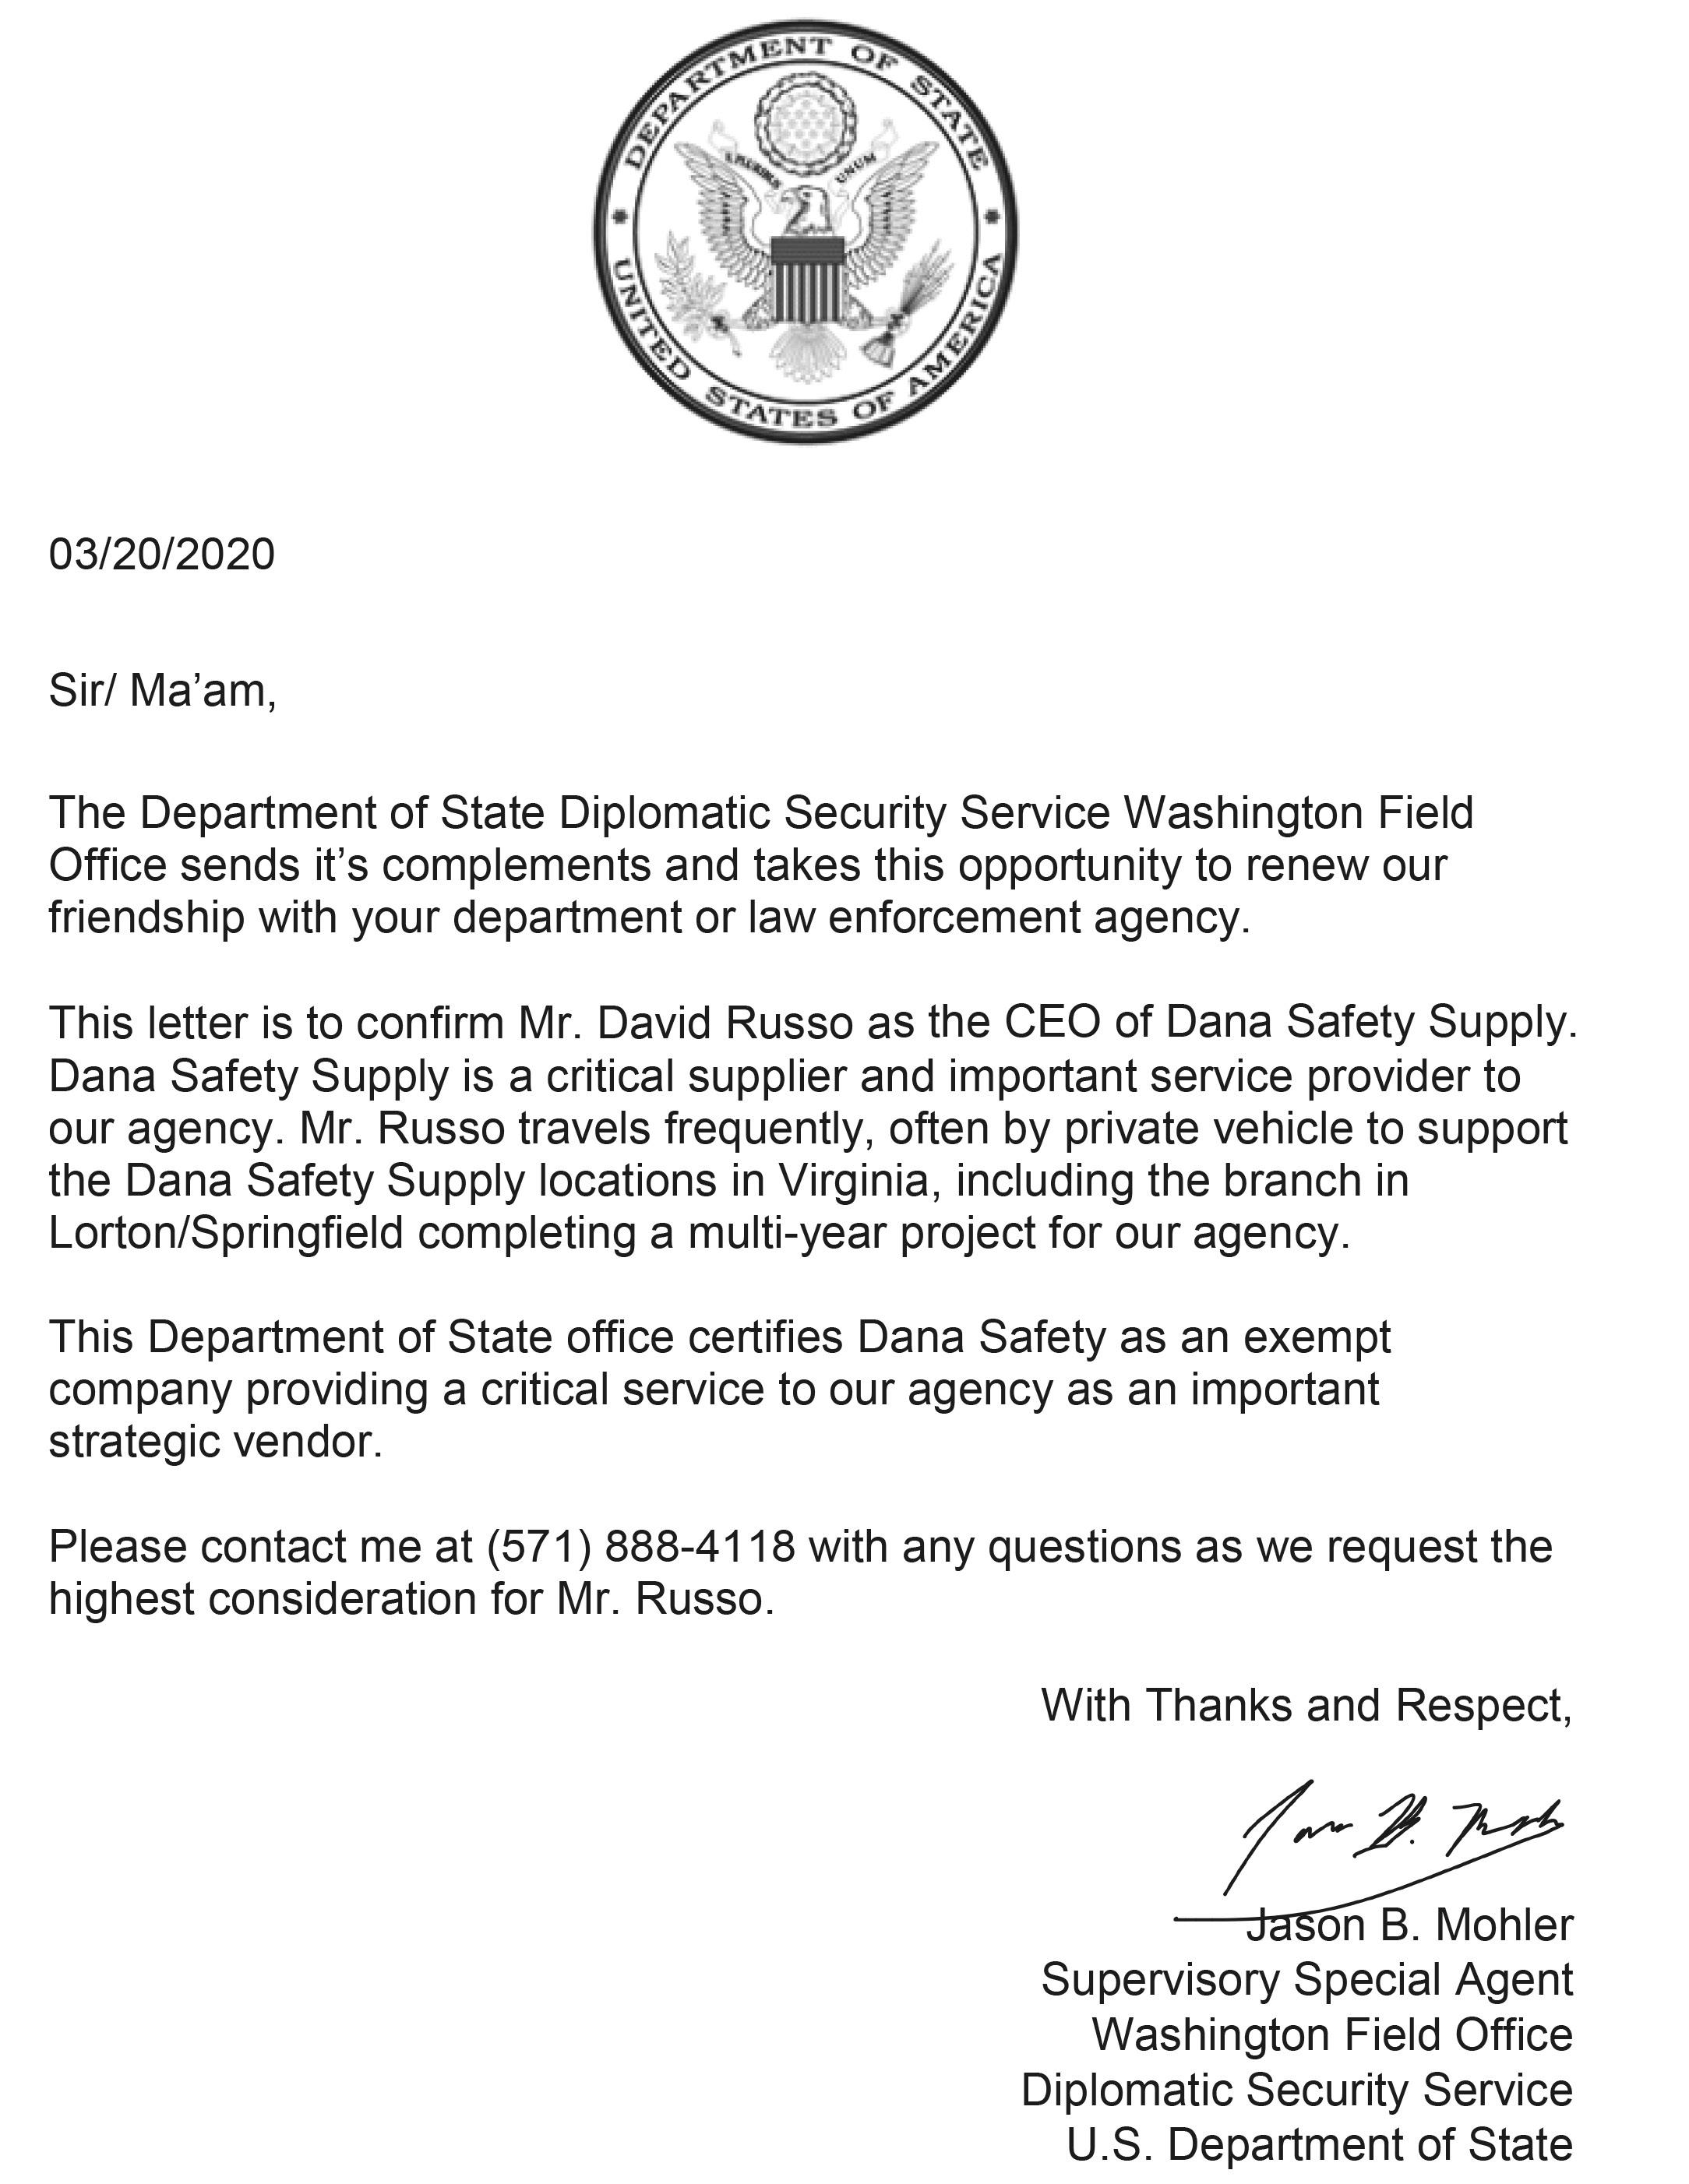 dana-safety-dss-wfo-letter-a-1.jpg